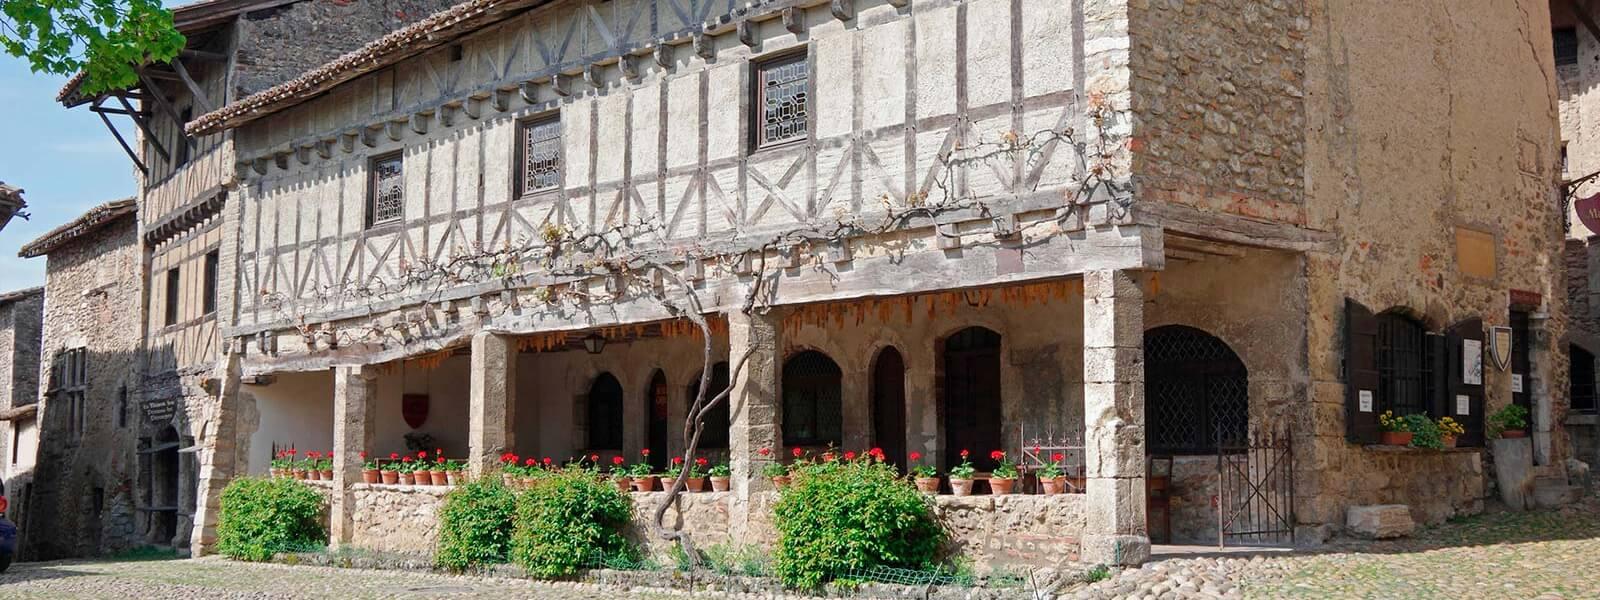 Kanpai Tourisme - Perouges medieval Town and La Dombes region